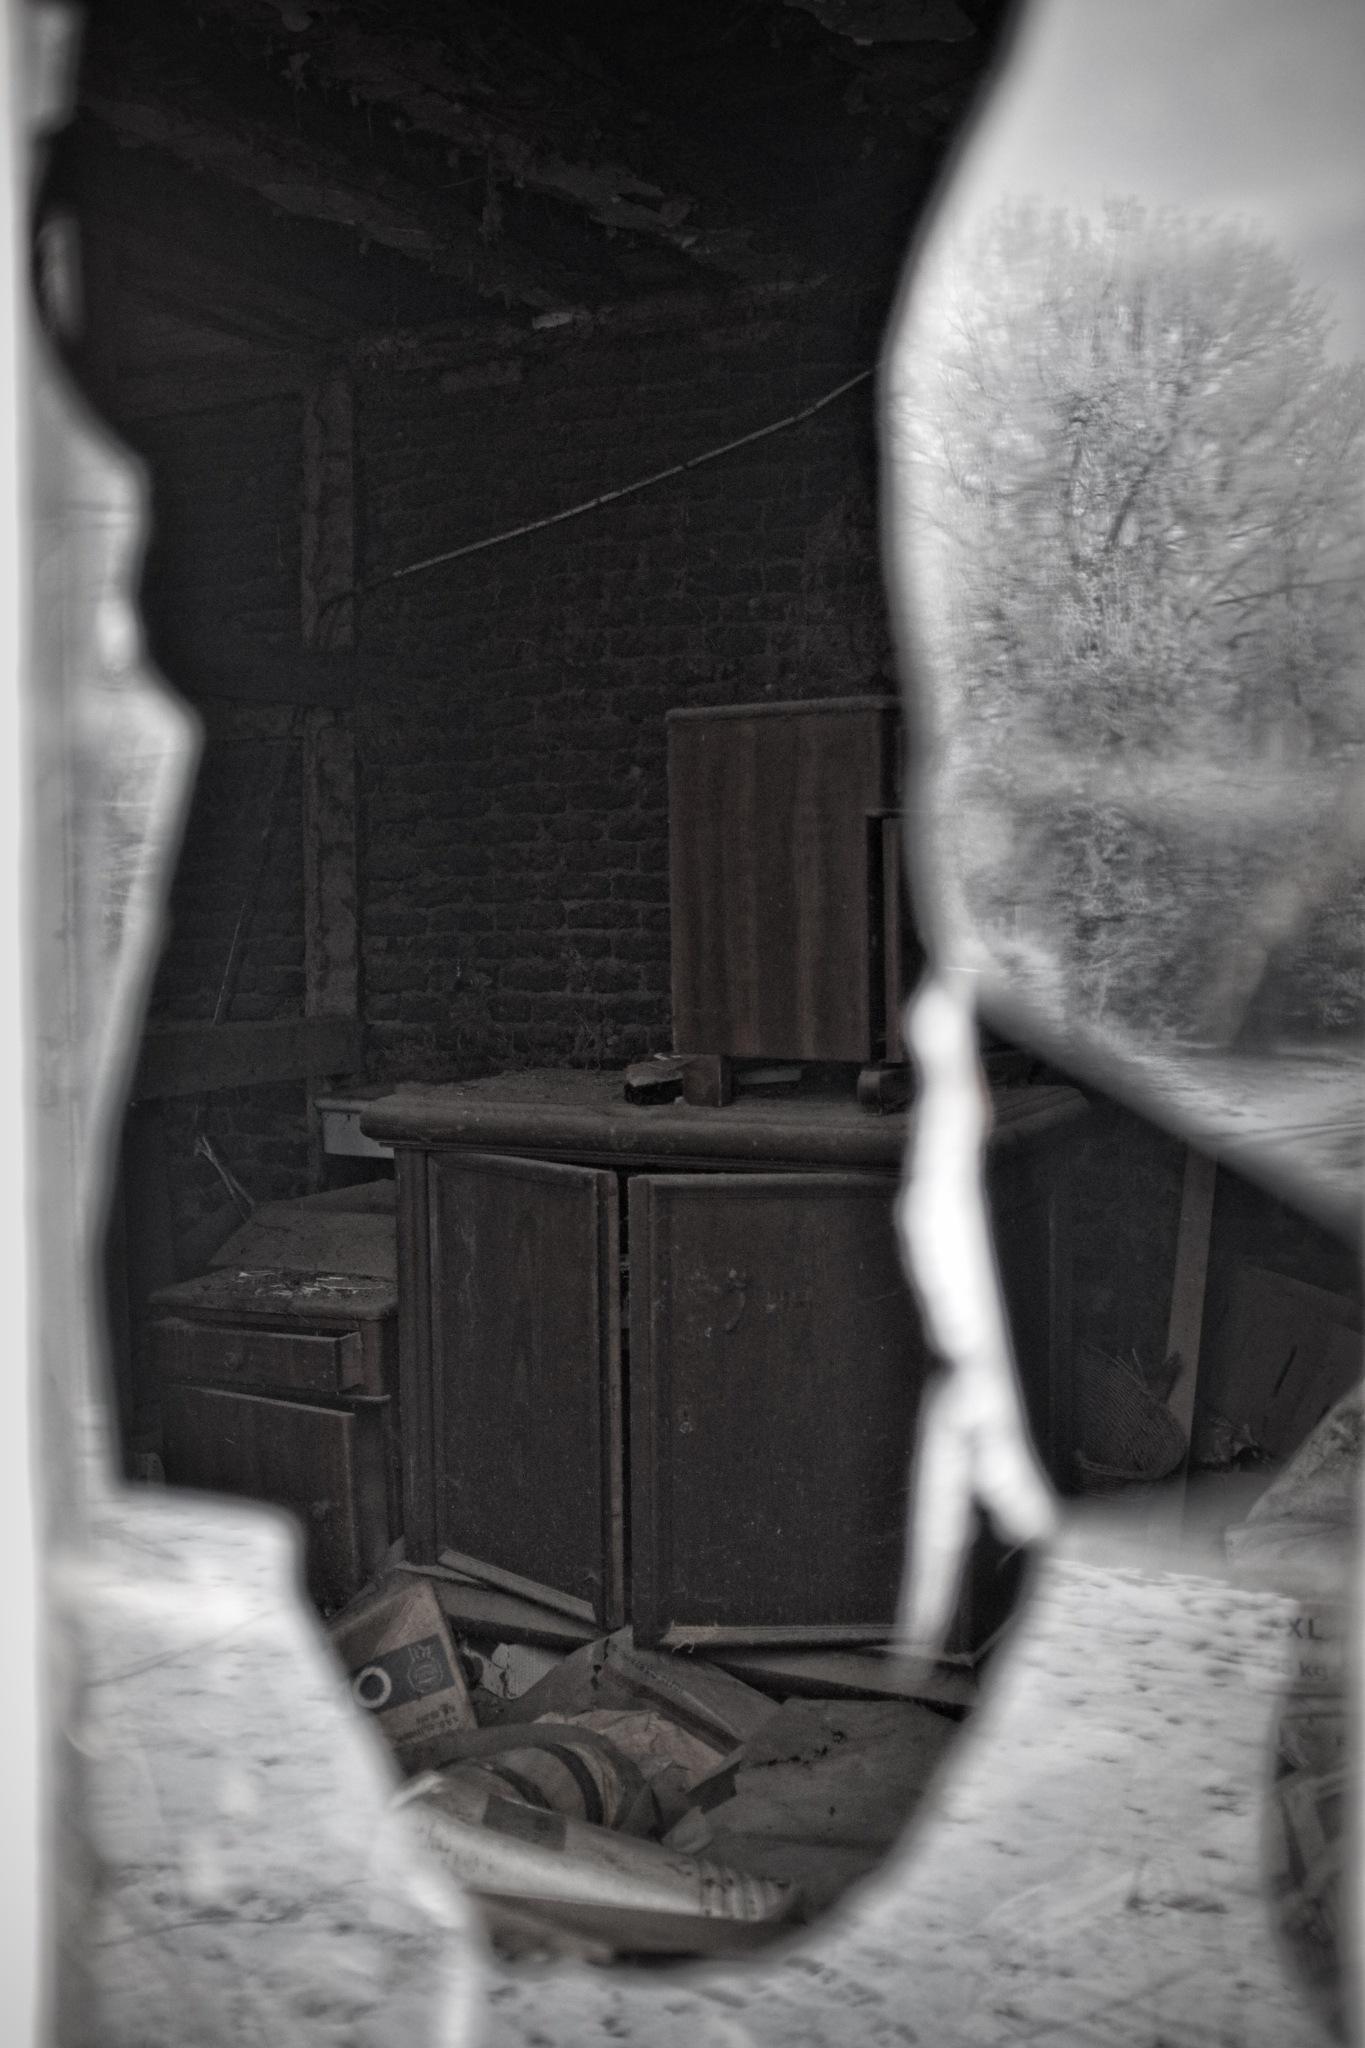 Inside by peterkryzun